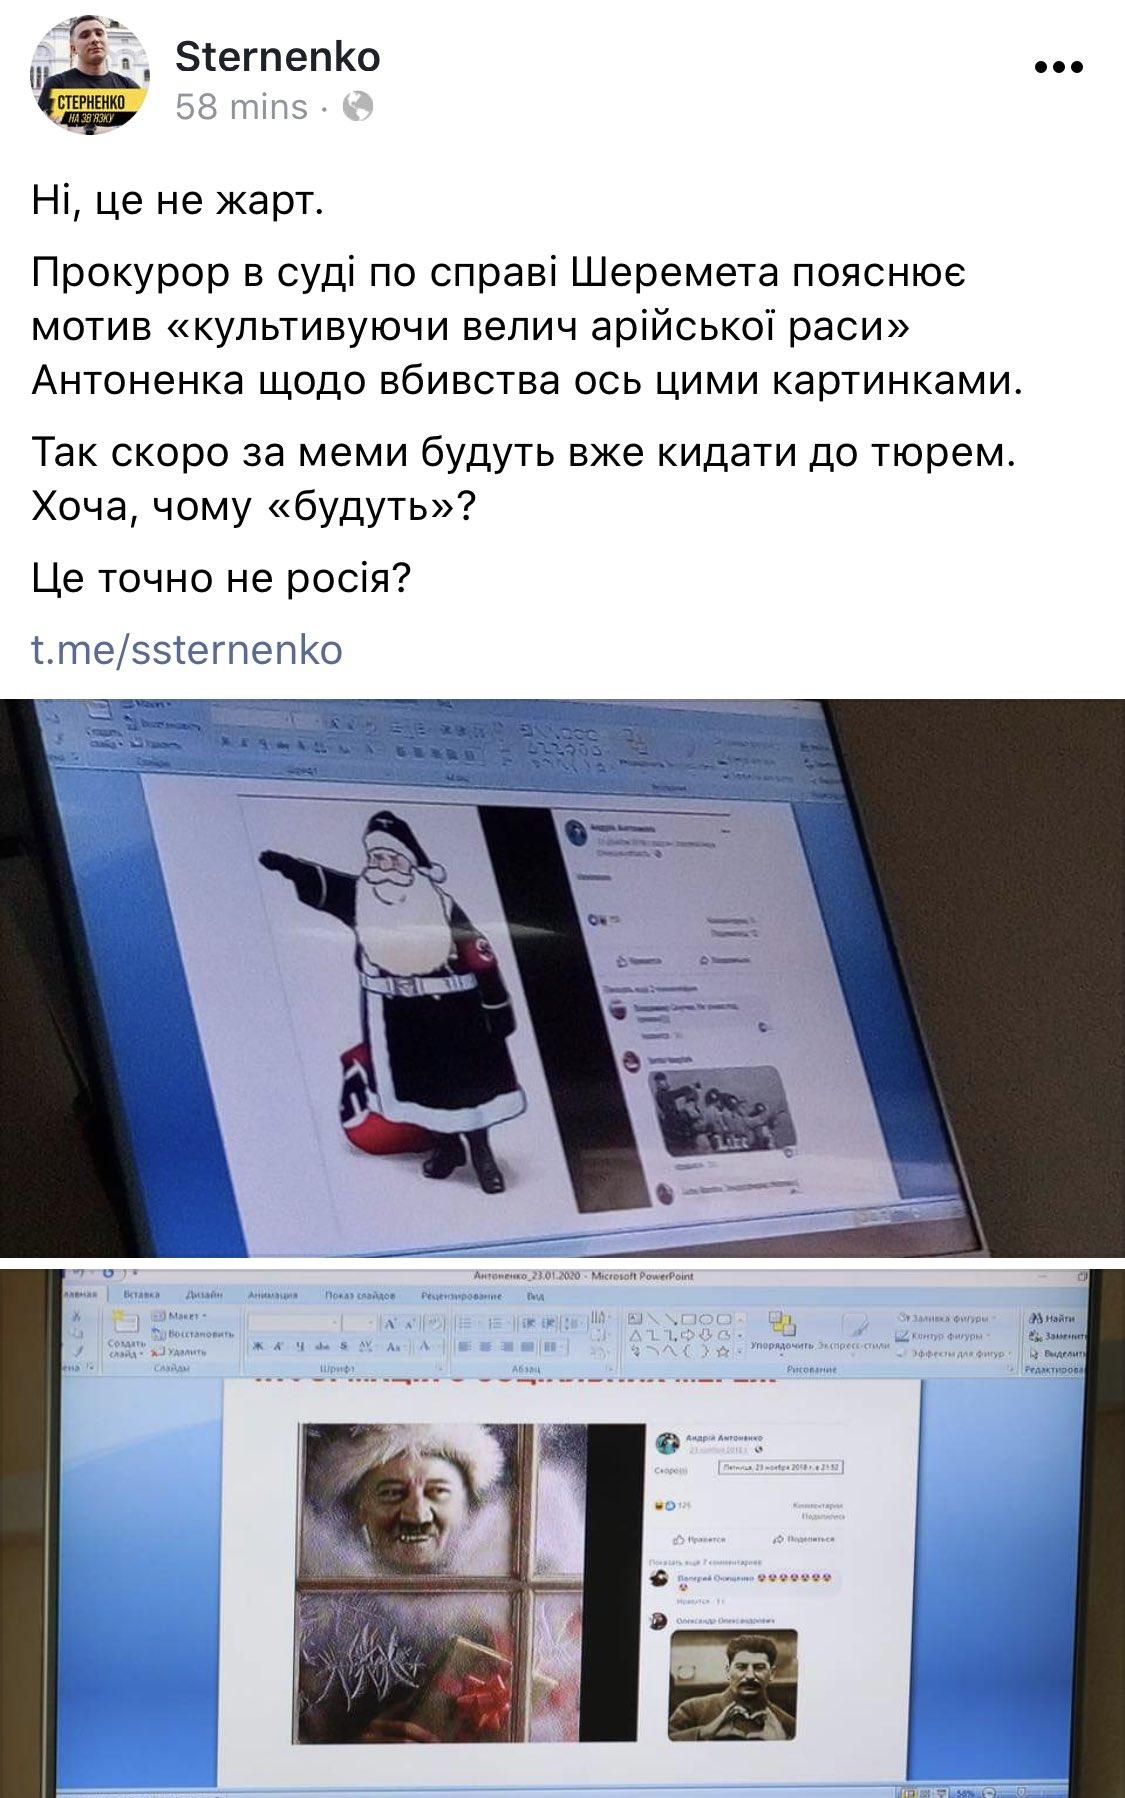 Убийство Шеремета: Печерский суд продлил арест Антоненко на 2 месяца - Цензор.НЕТ 8960